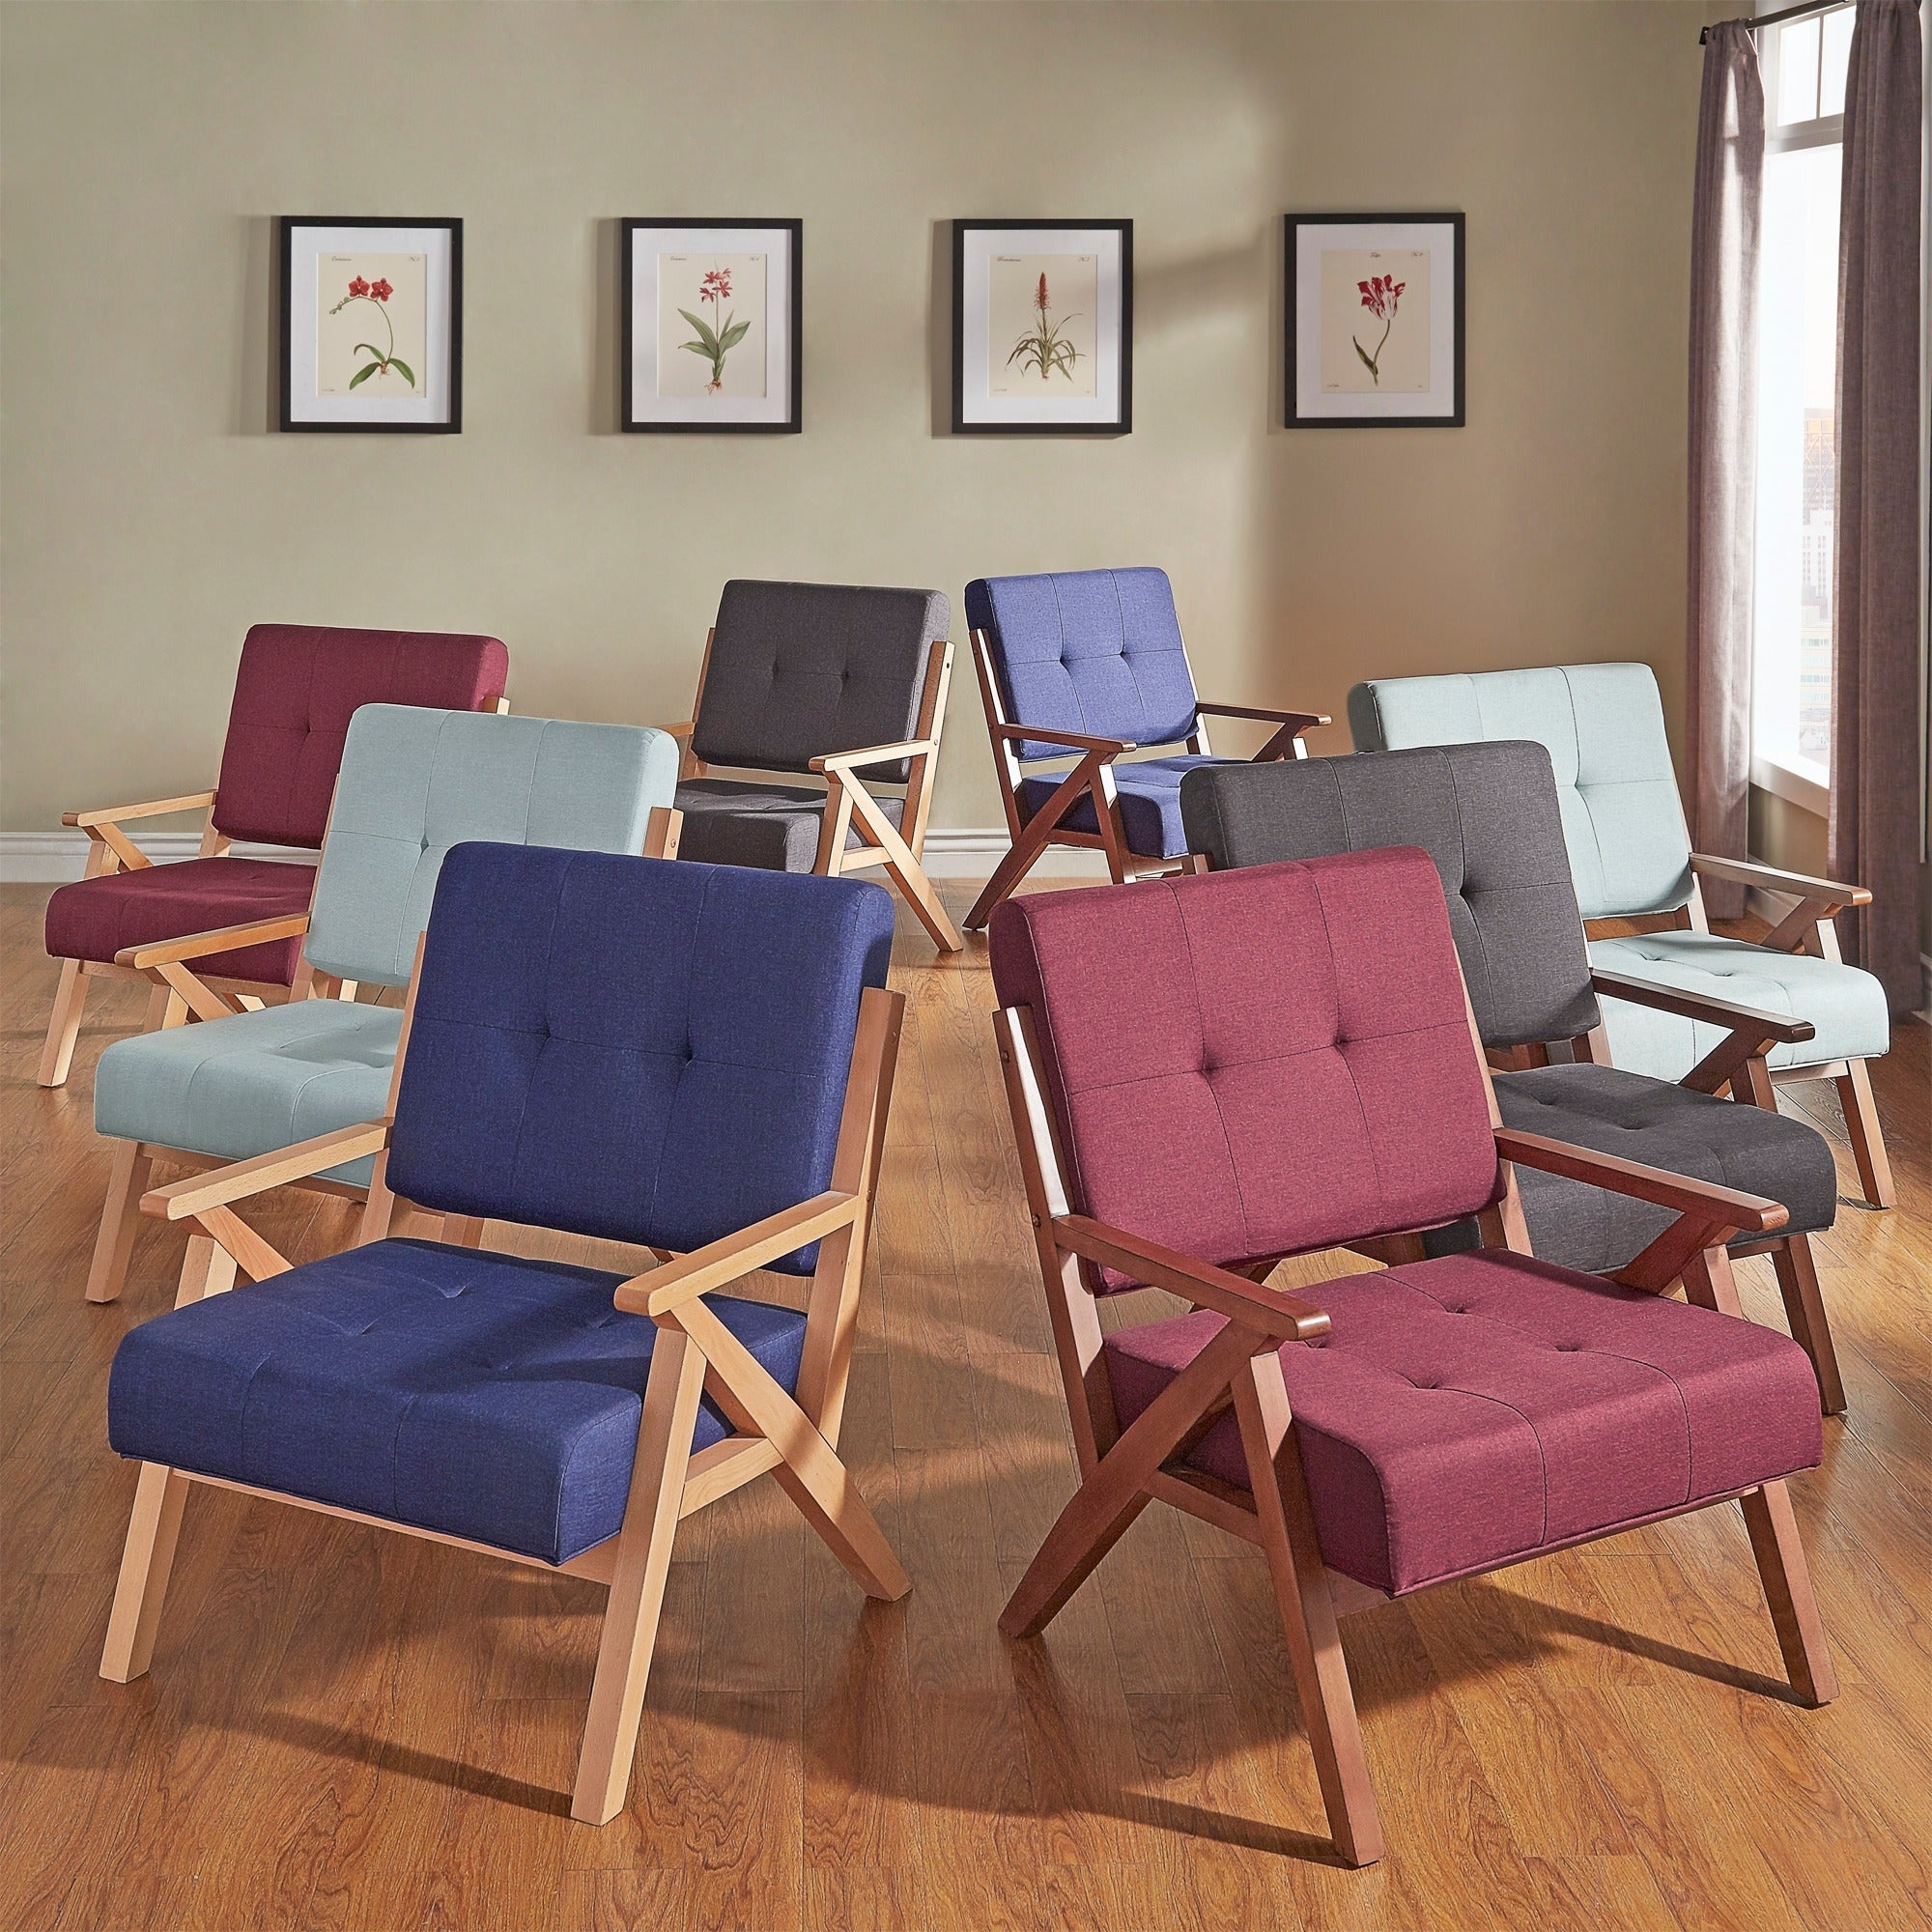 Emilia Midcentury Danish Modern Arm Chair INSPIRE Q Modern